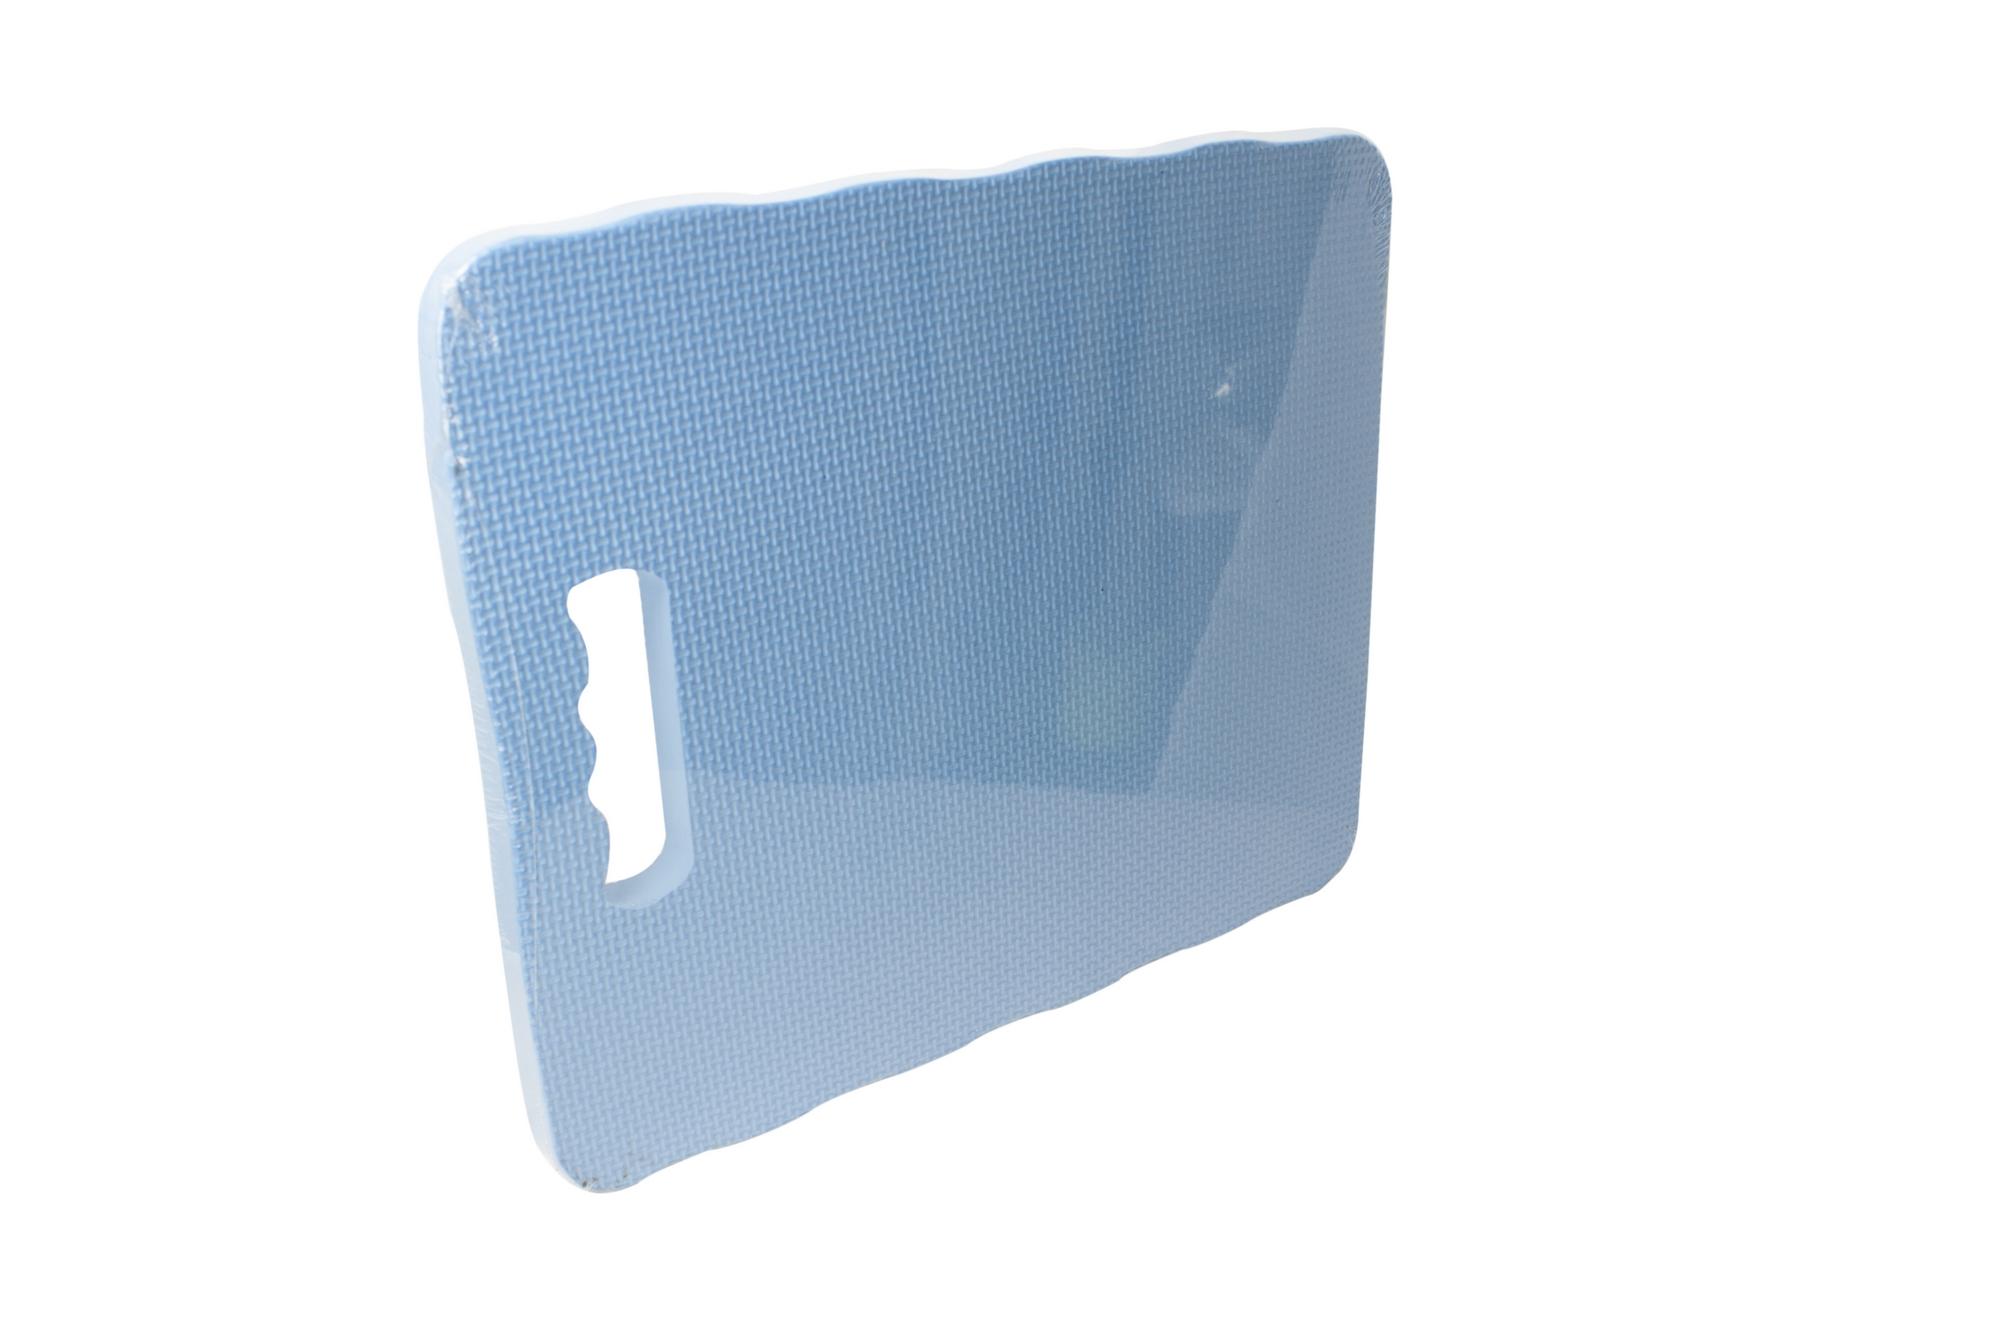 Blue jumbo gardening kneeler pad 30 x 34cm blendboutique for Gardening kneeling pads